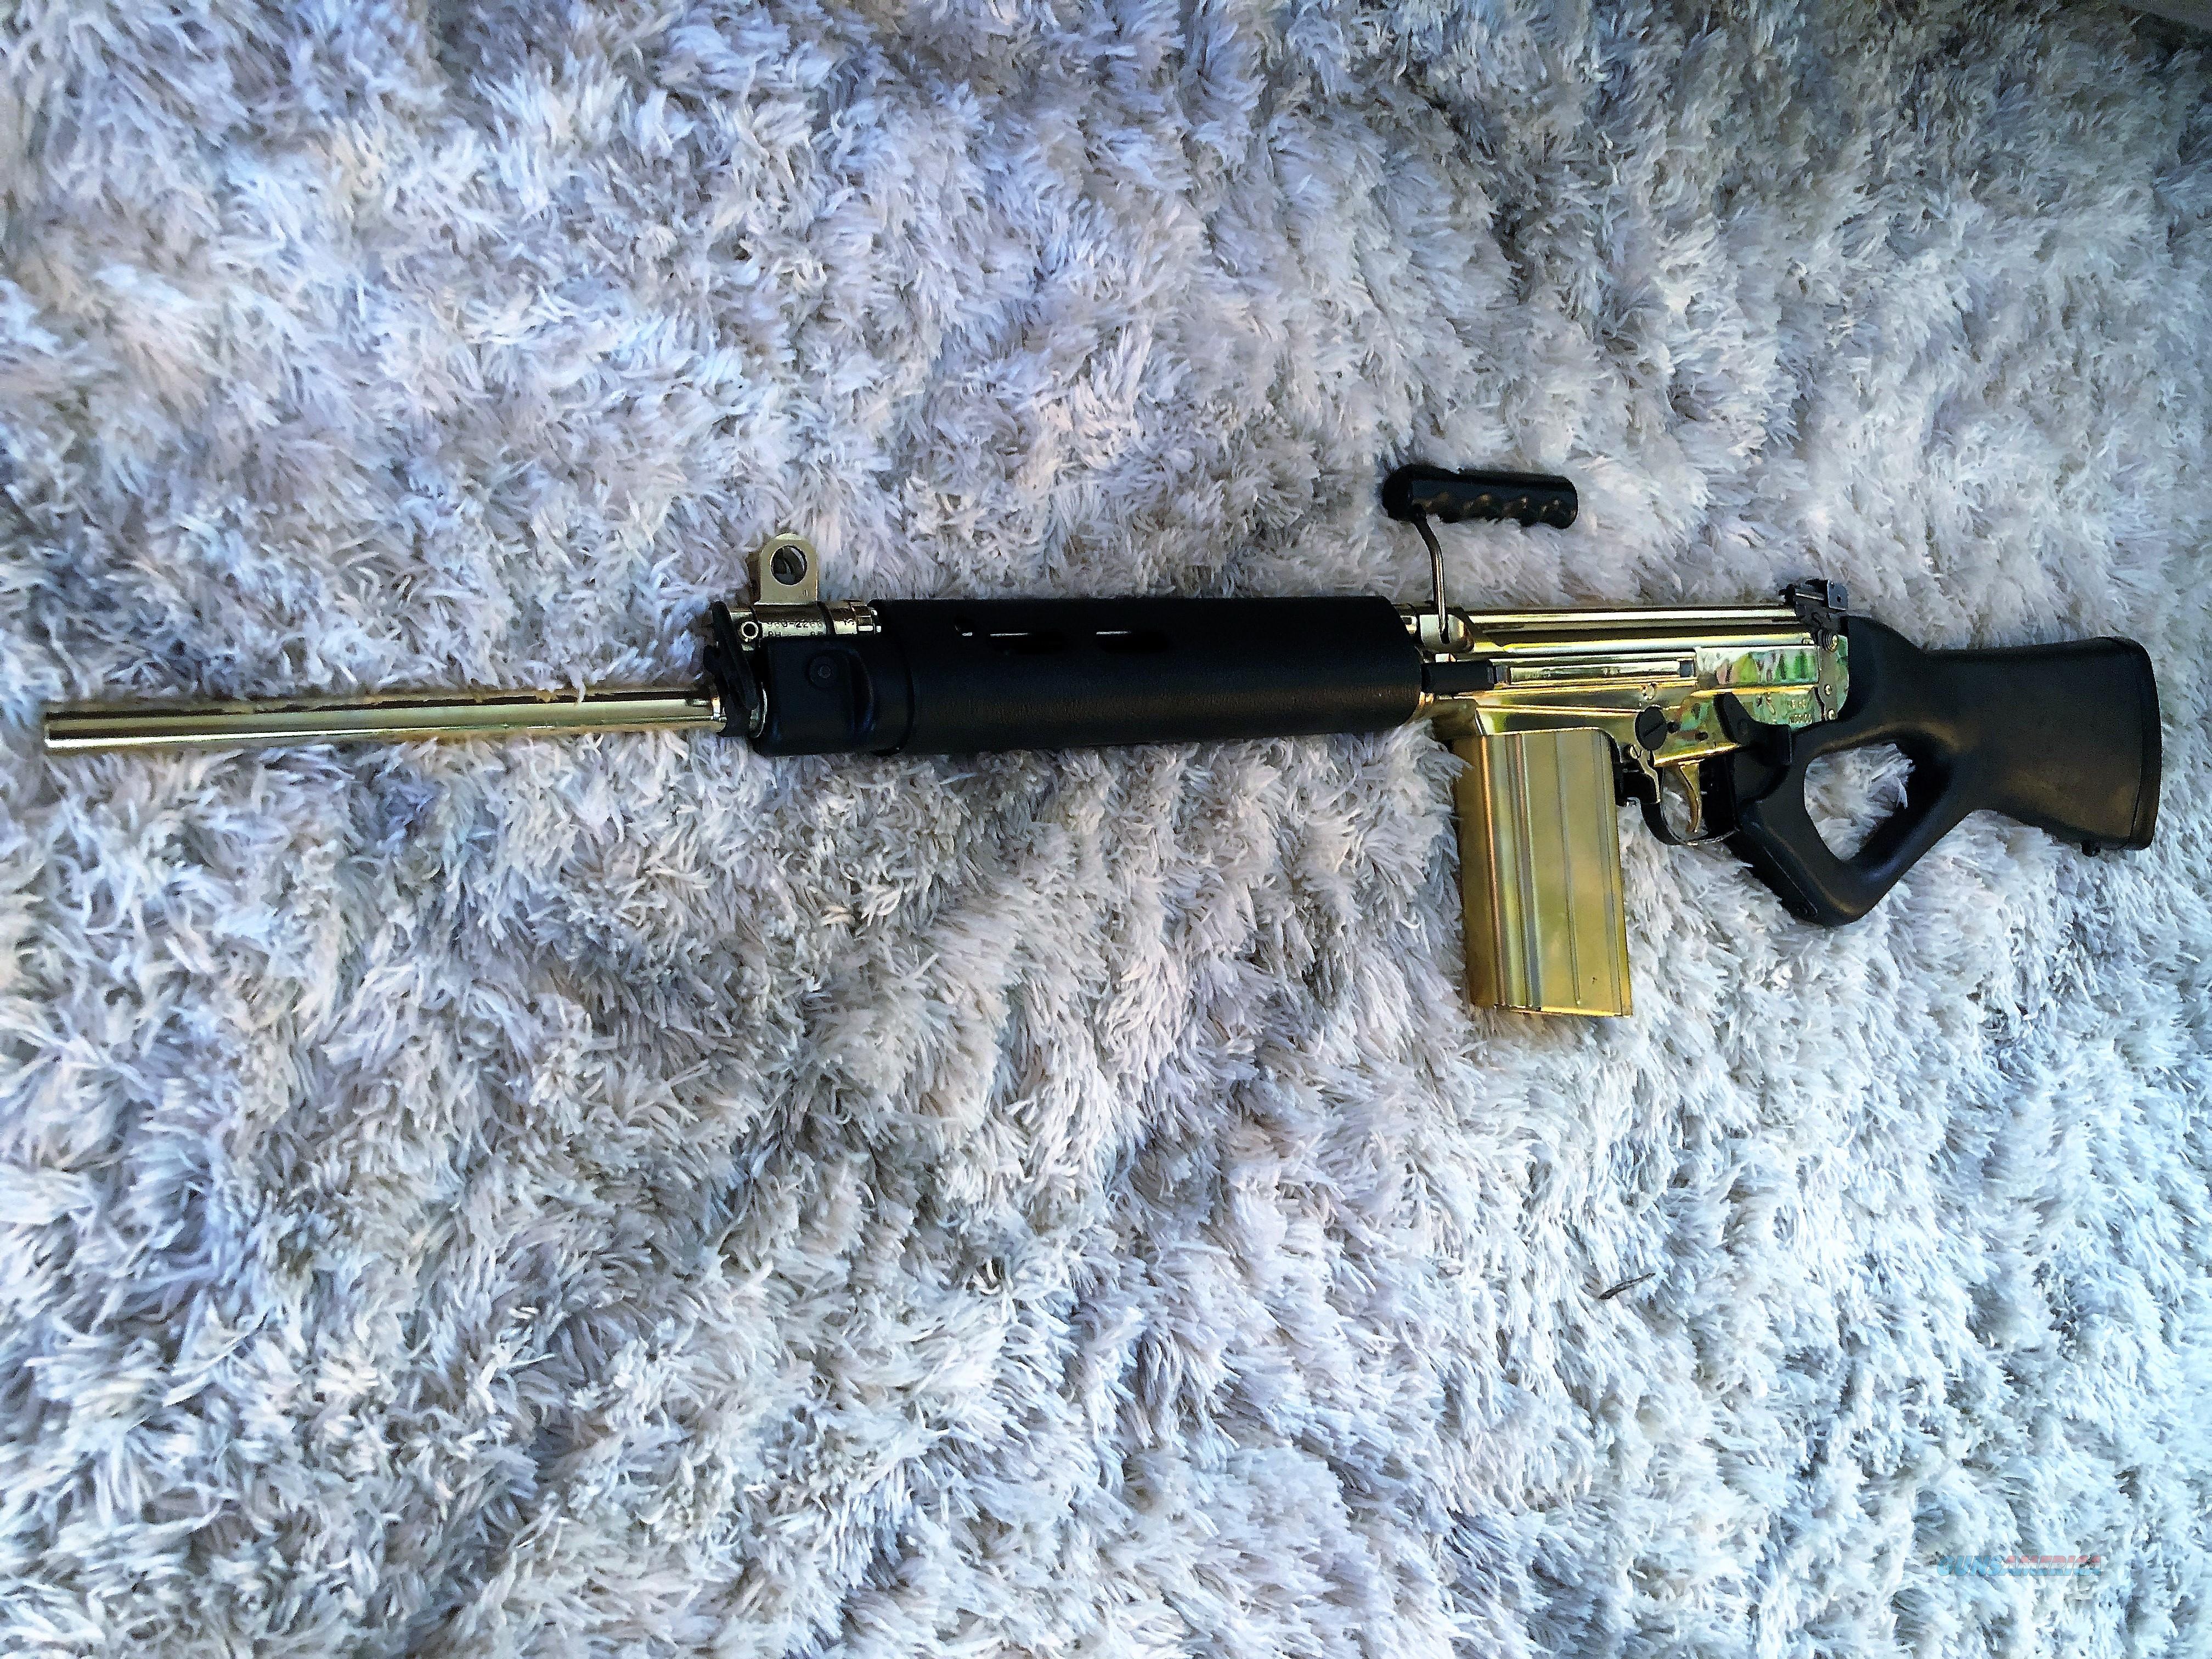 CUSTOM 24k FULL GOLD PLATED FAL .308 semi auto imbel rifle century arms MUST SEE  Guns > Rifles > Century International Arms - Rifles > Rifles